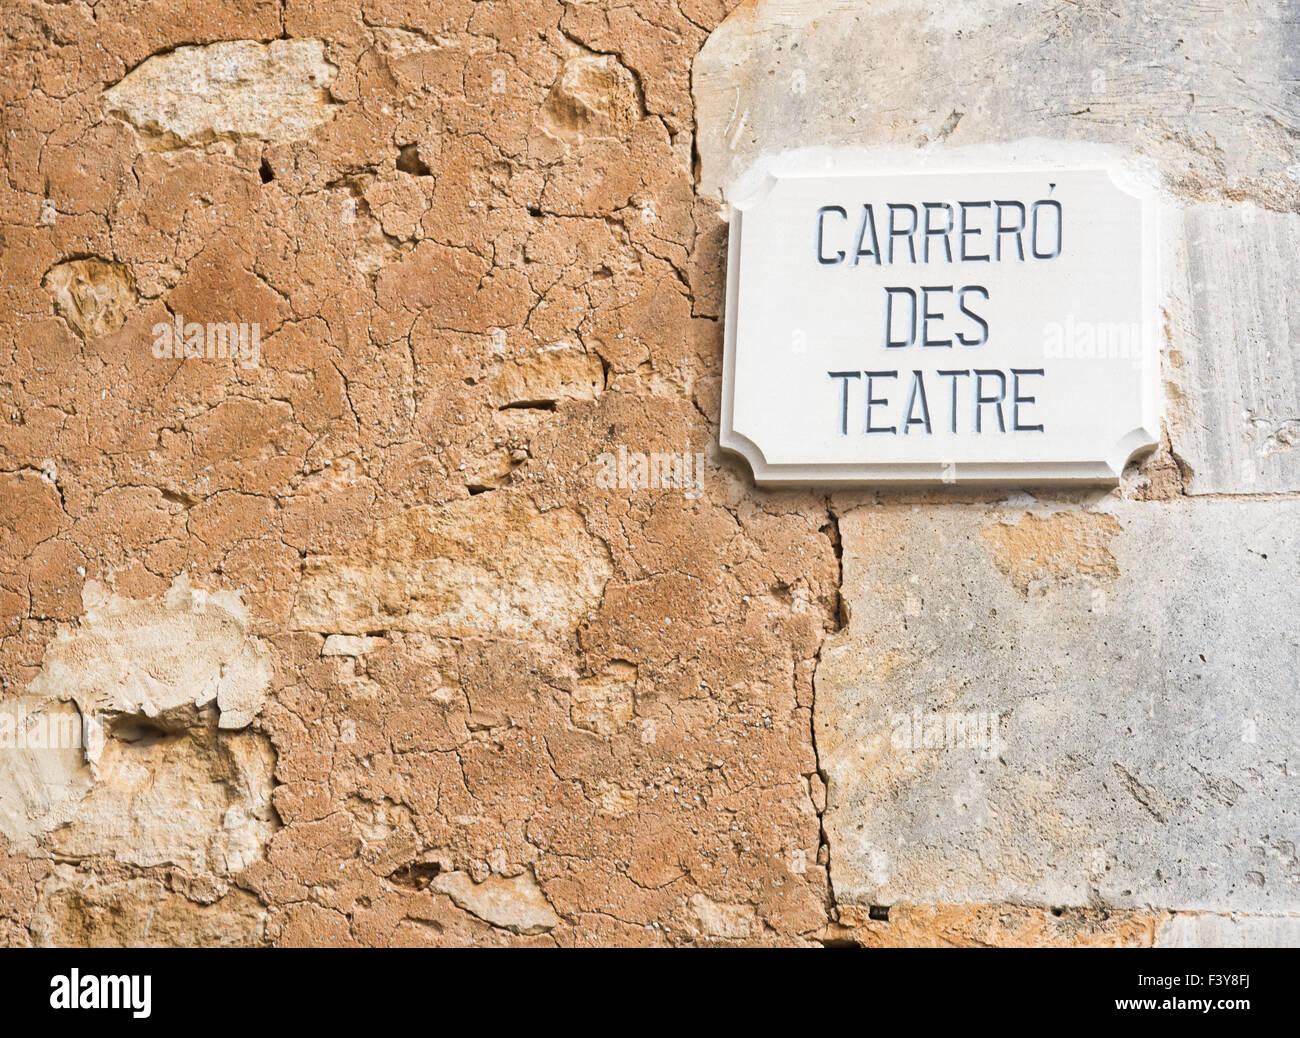 Old wall Carrero des teatre - Stock Image